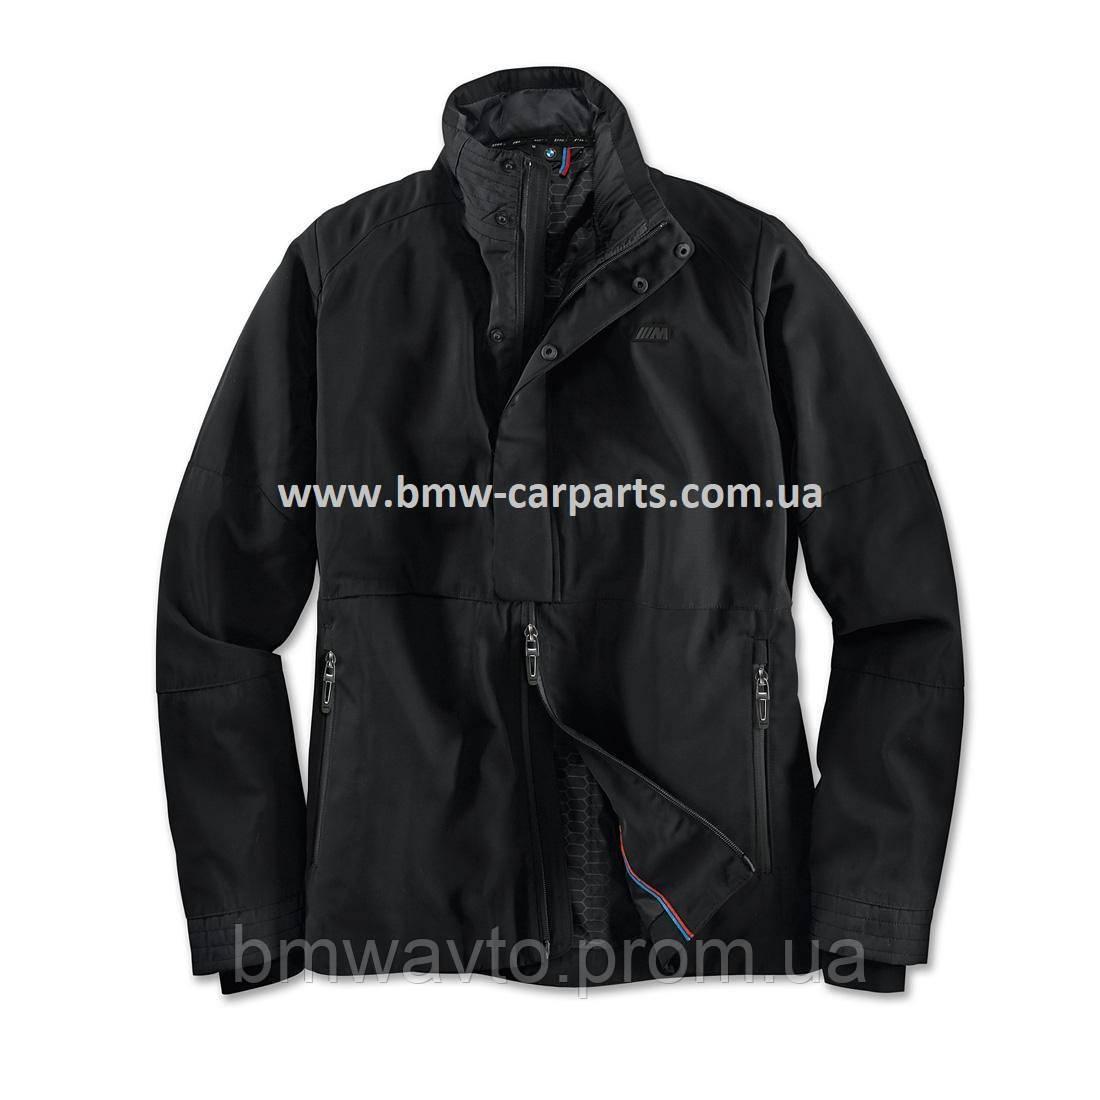 Мужская куртка BMW M Jacket, Men